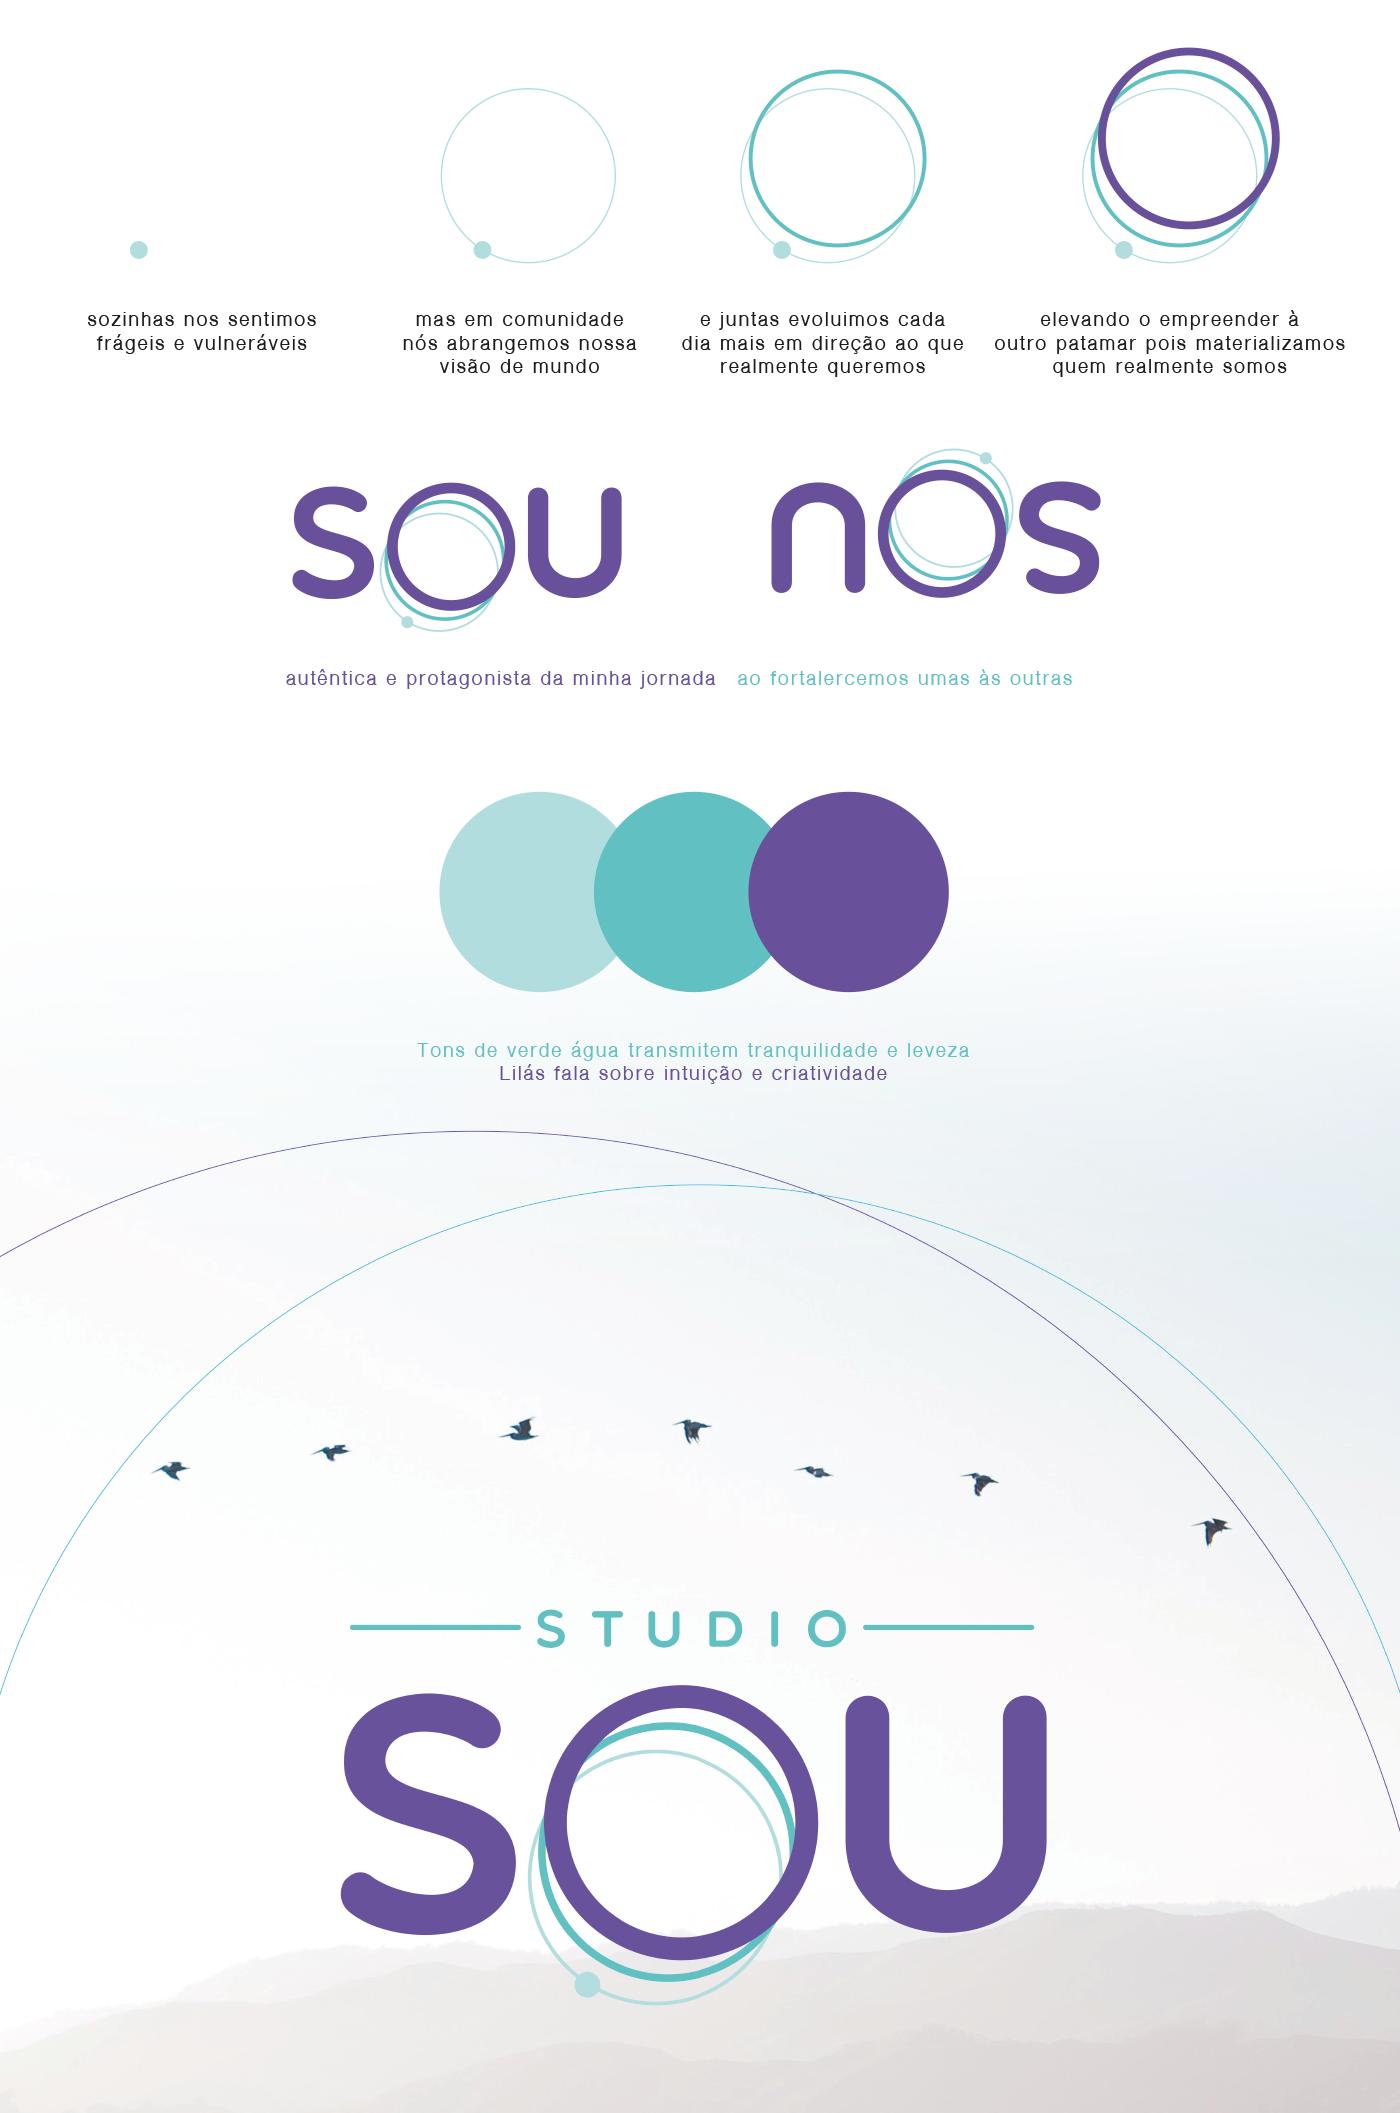 brand branding  identidade visual logo Logotipo Logotype marca